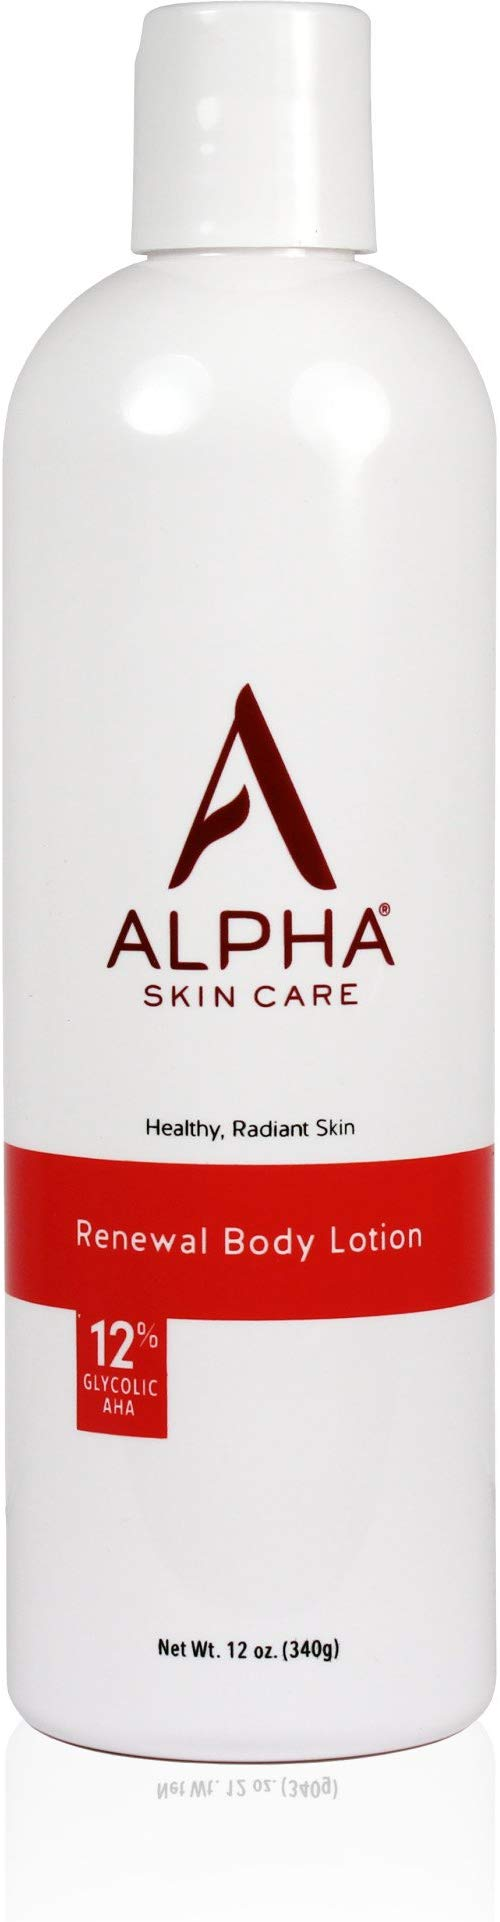 Alpha Skin Care Revitalizing Body Lotion With 12 Glycolic Aha New 12 Ounces Original Version Amazon Com Au B Skin Moisturizer Skin Care Healthy Radiant Skin